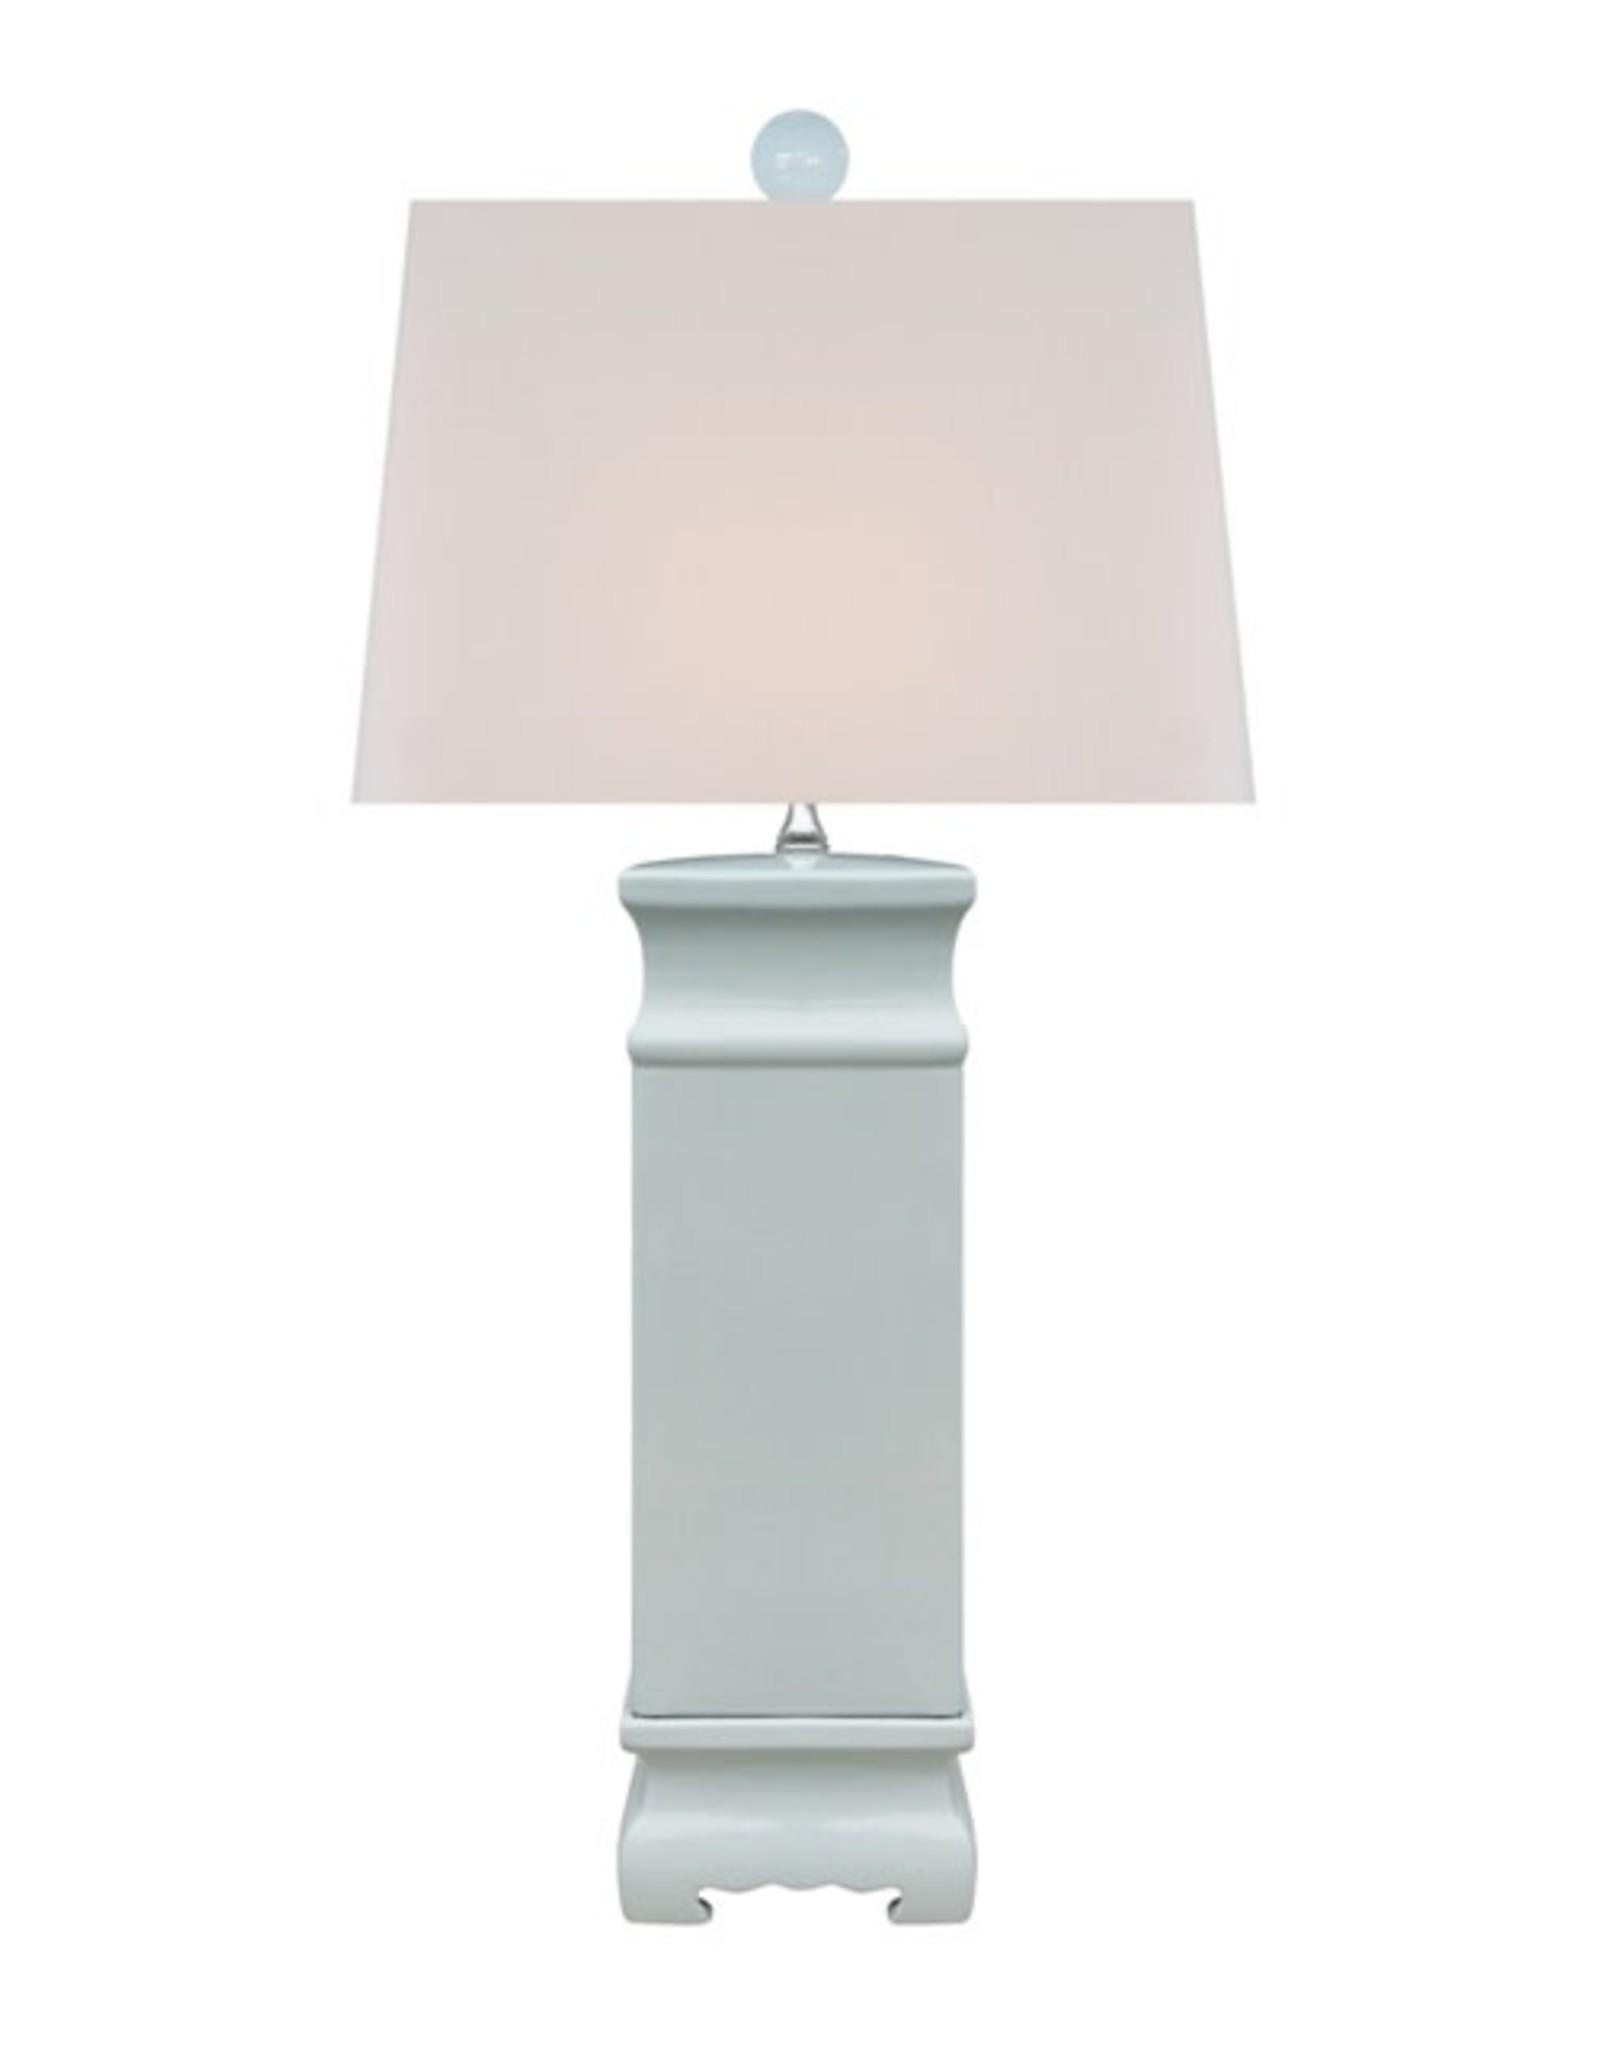 Oak + Arrow Interiors Palladian Blue Square Lamp